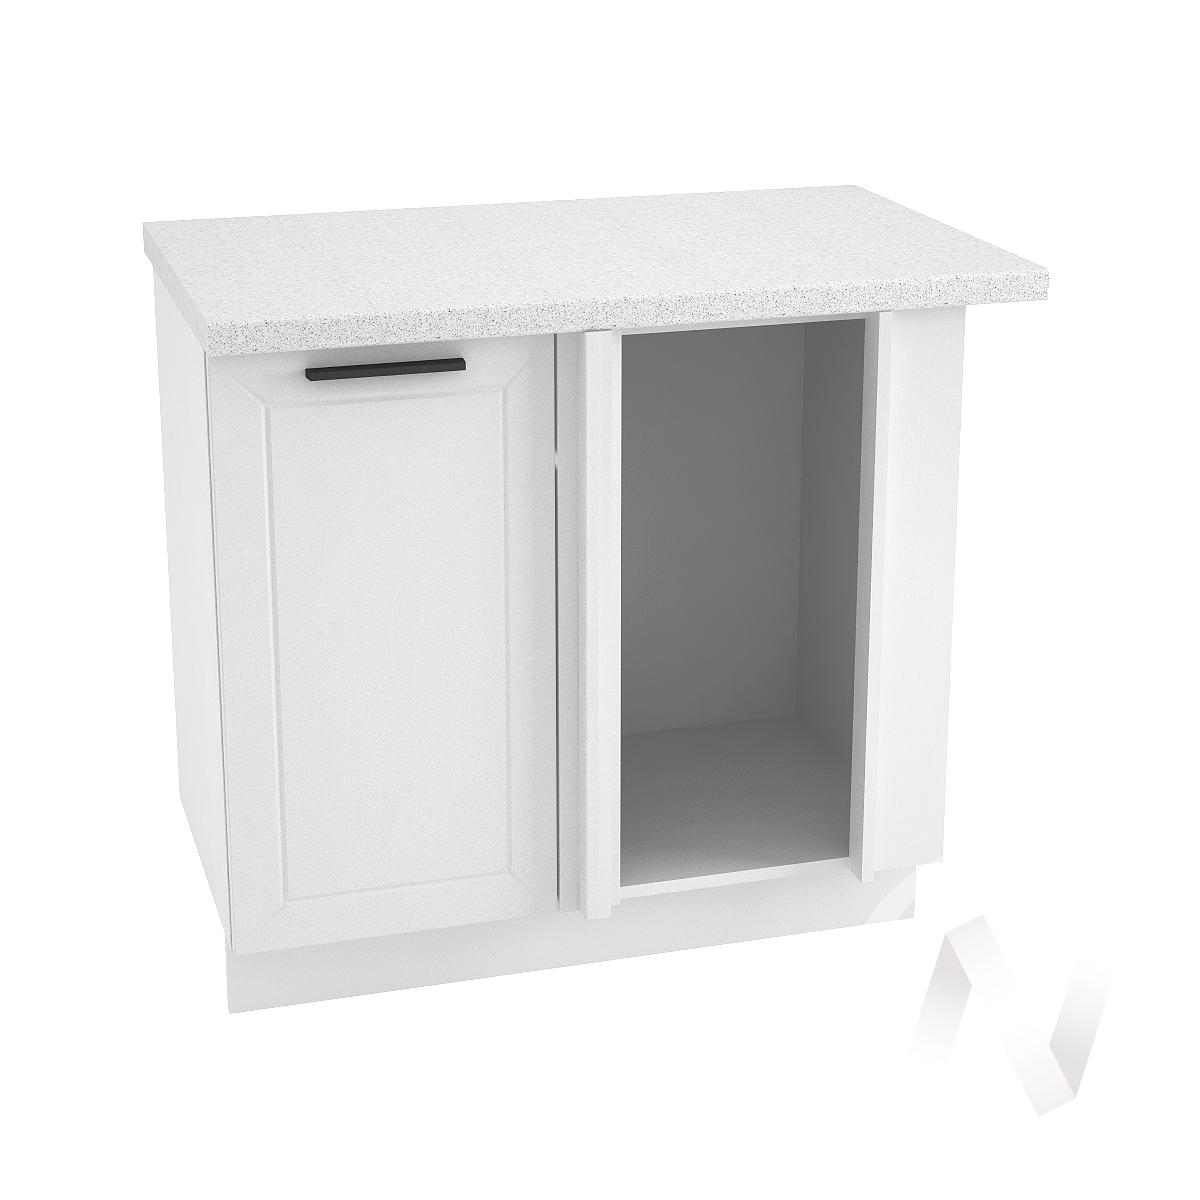 "Кухня ""Глетчер"": Шкаф нижний угловой 990М, ШНУ 990М (Айленд силк/корпус белый)"